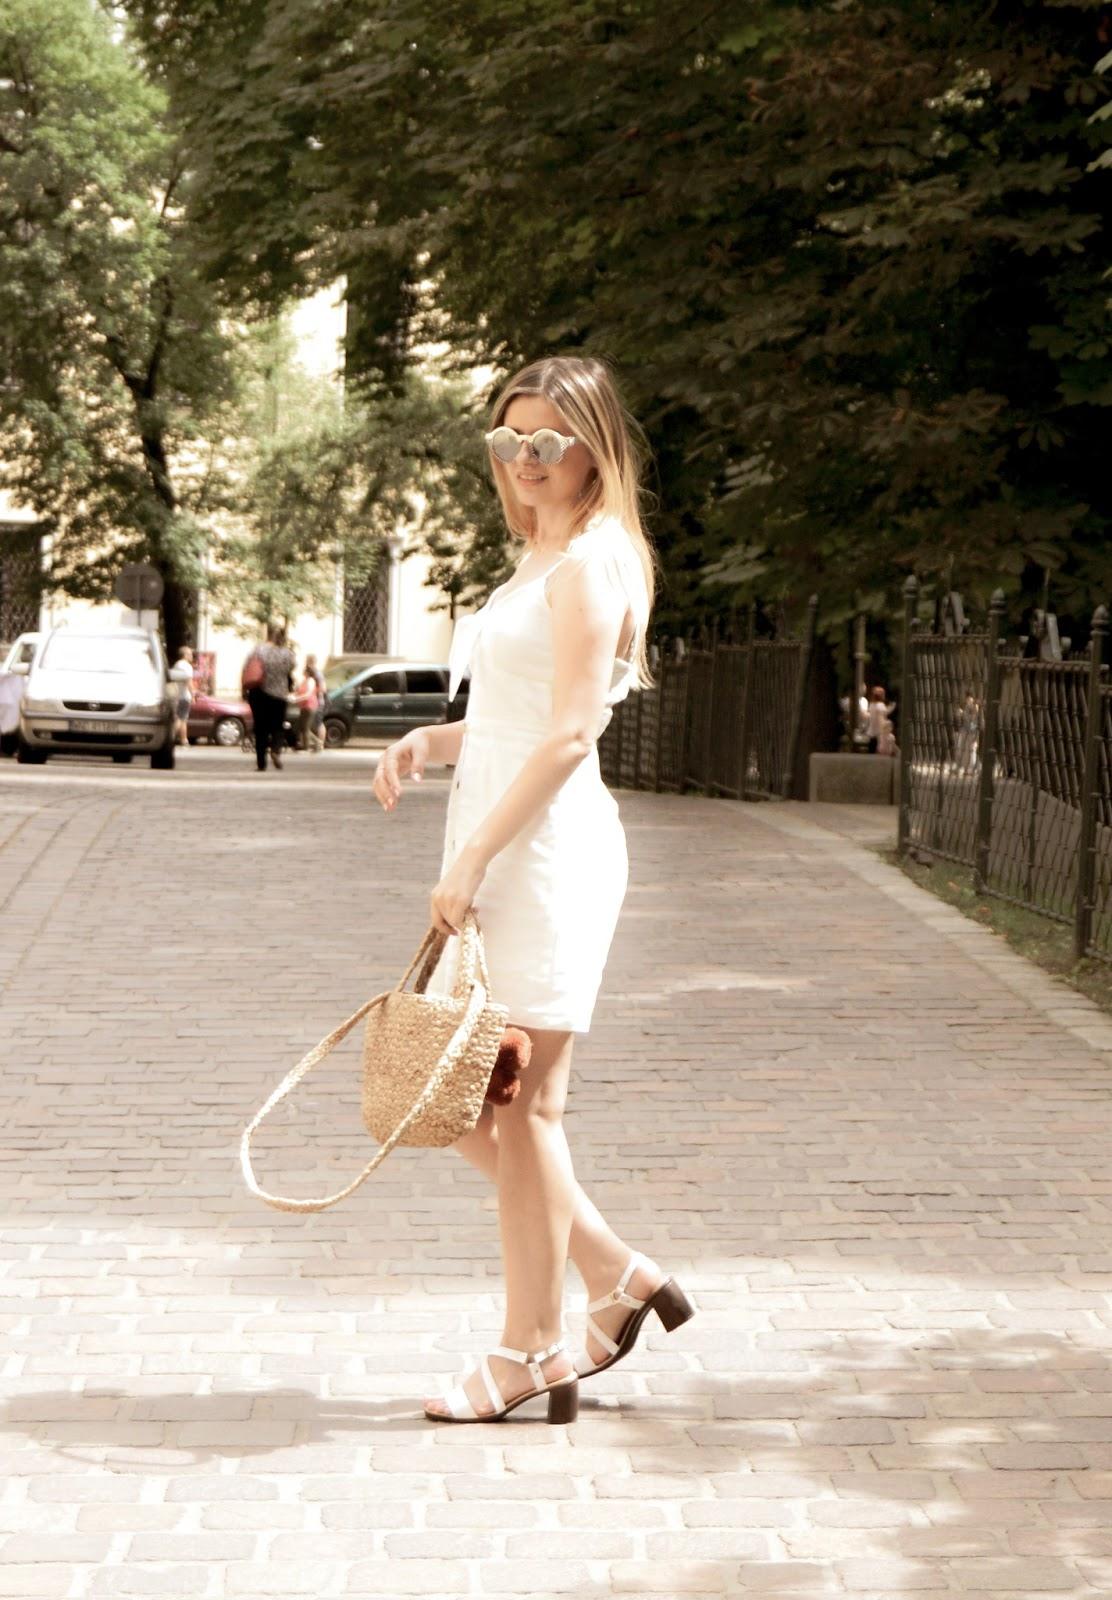 Sukienka na lato i jutowy koszyk